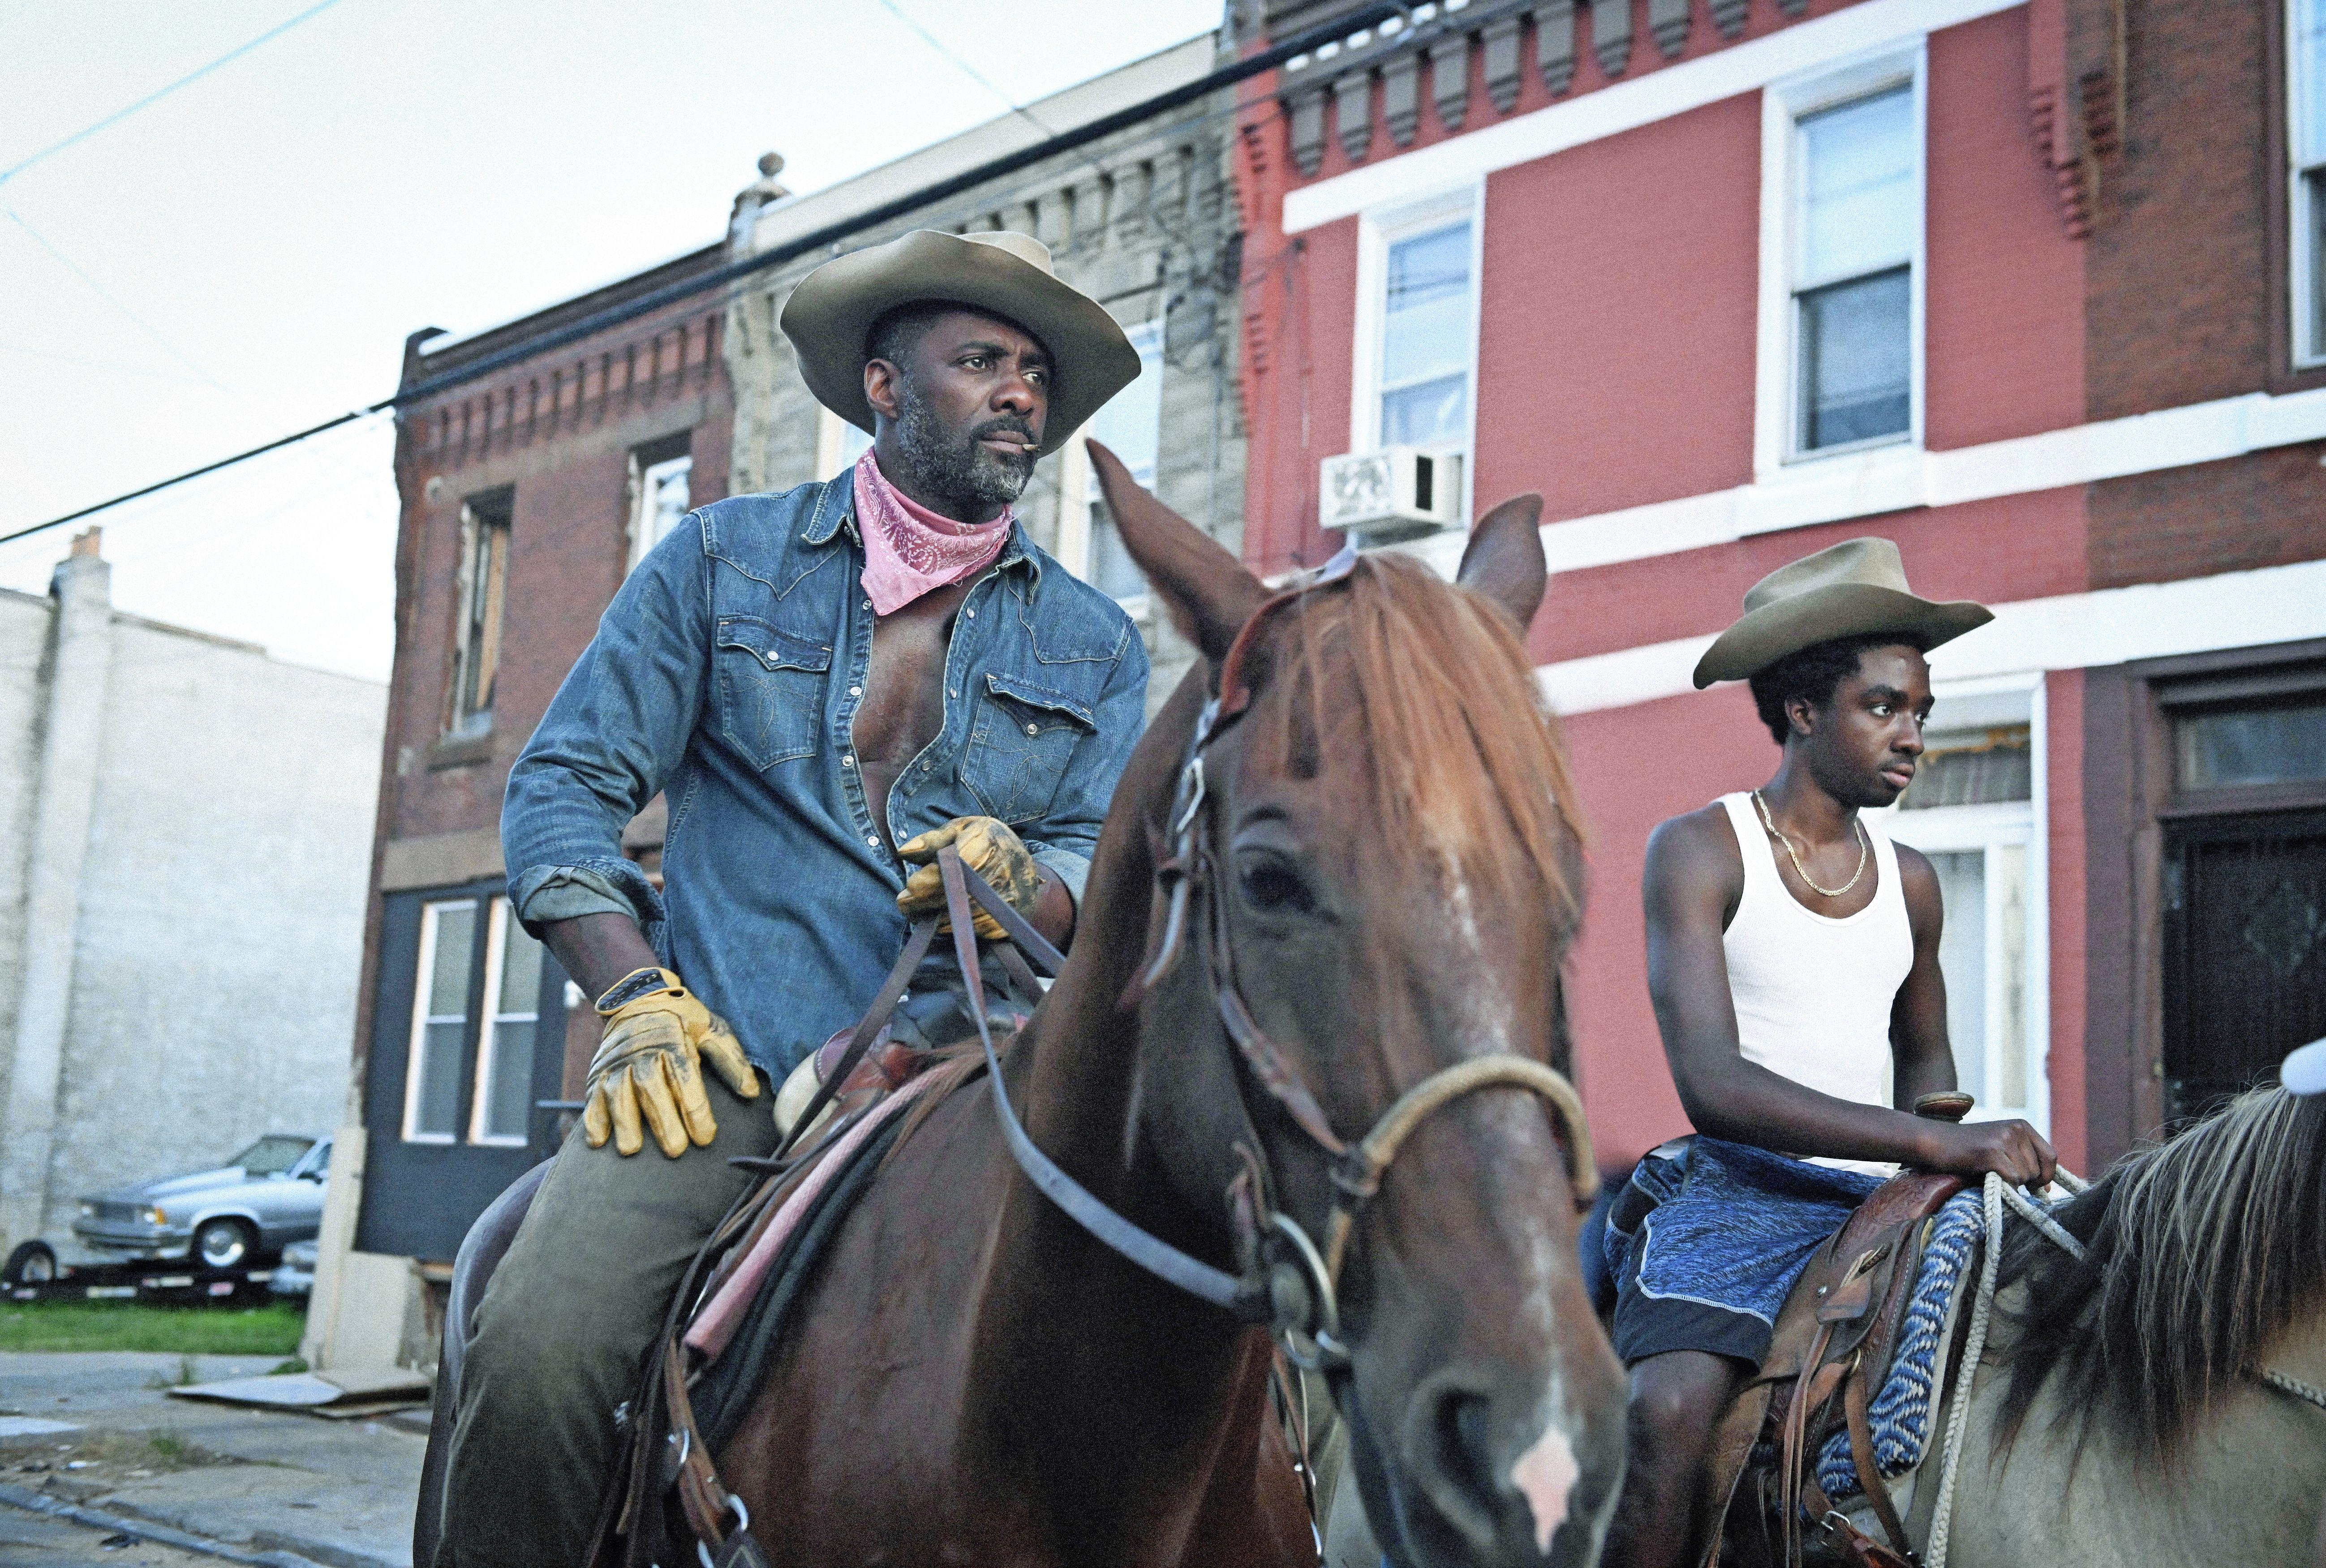 Filmrecensie 'Concrete cowboy': Mooi beeld van urban cowboy-cultuur